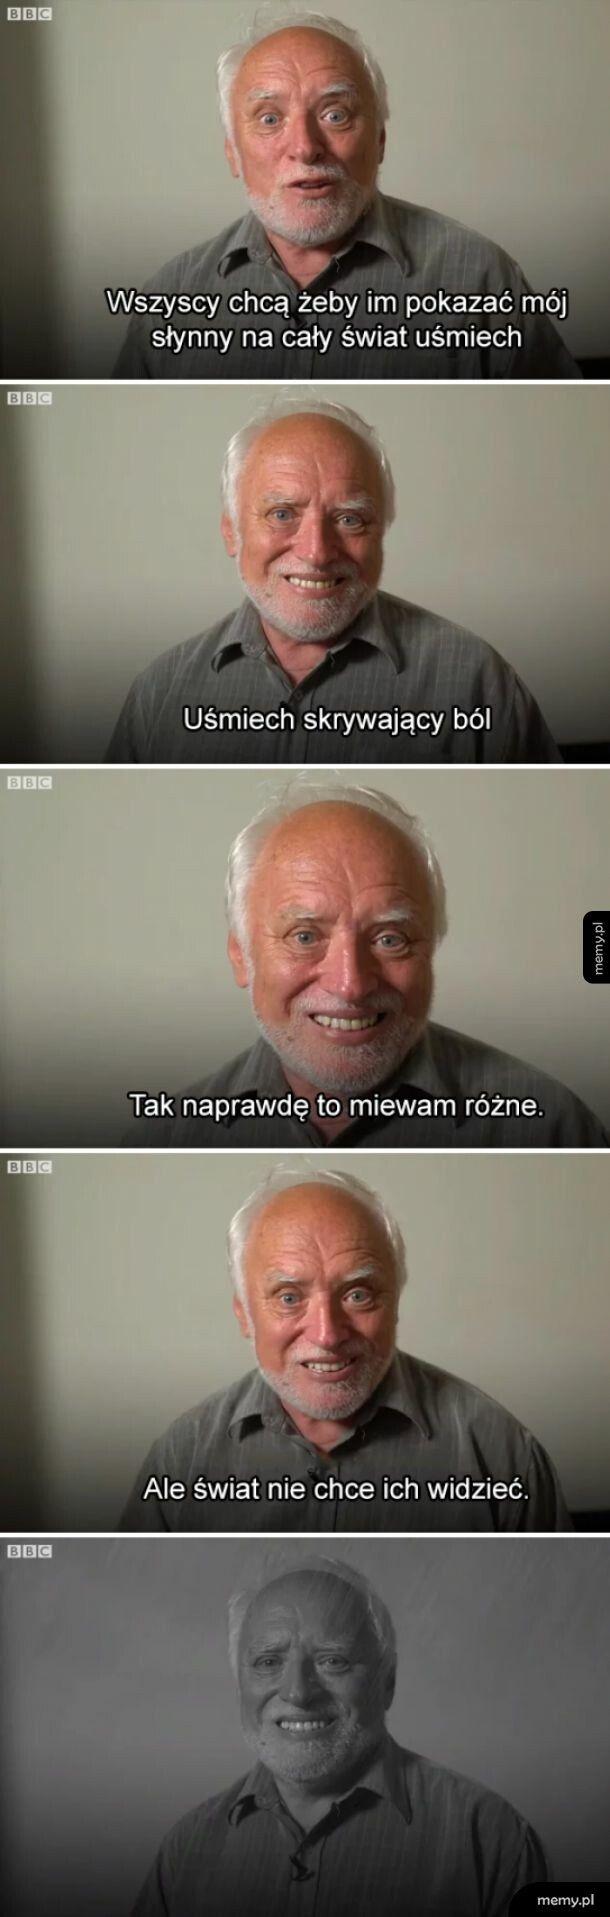 Bolesny uśmiech Harolda